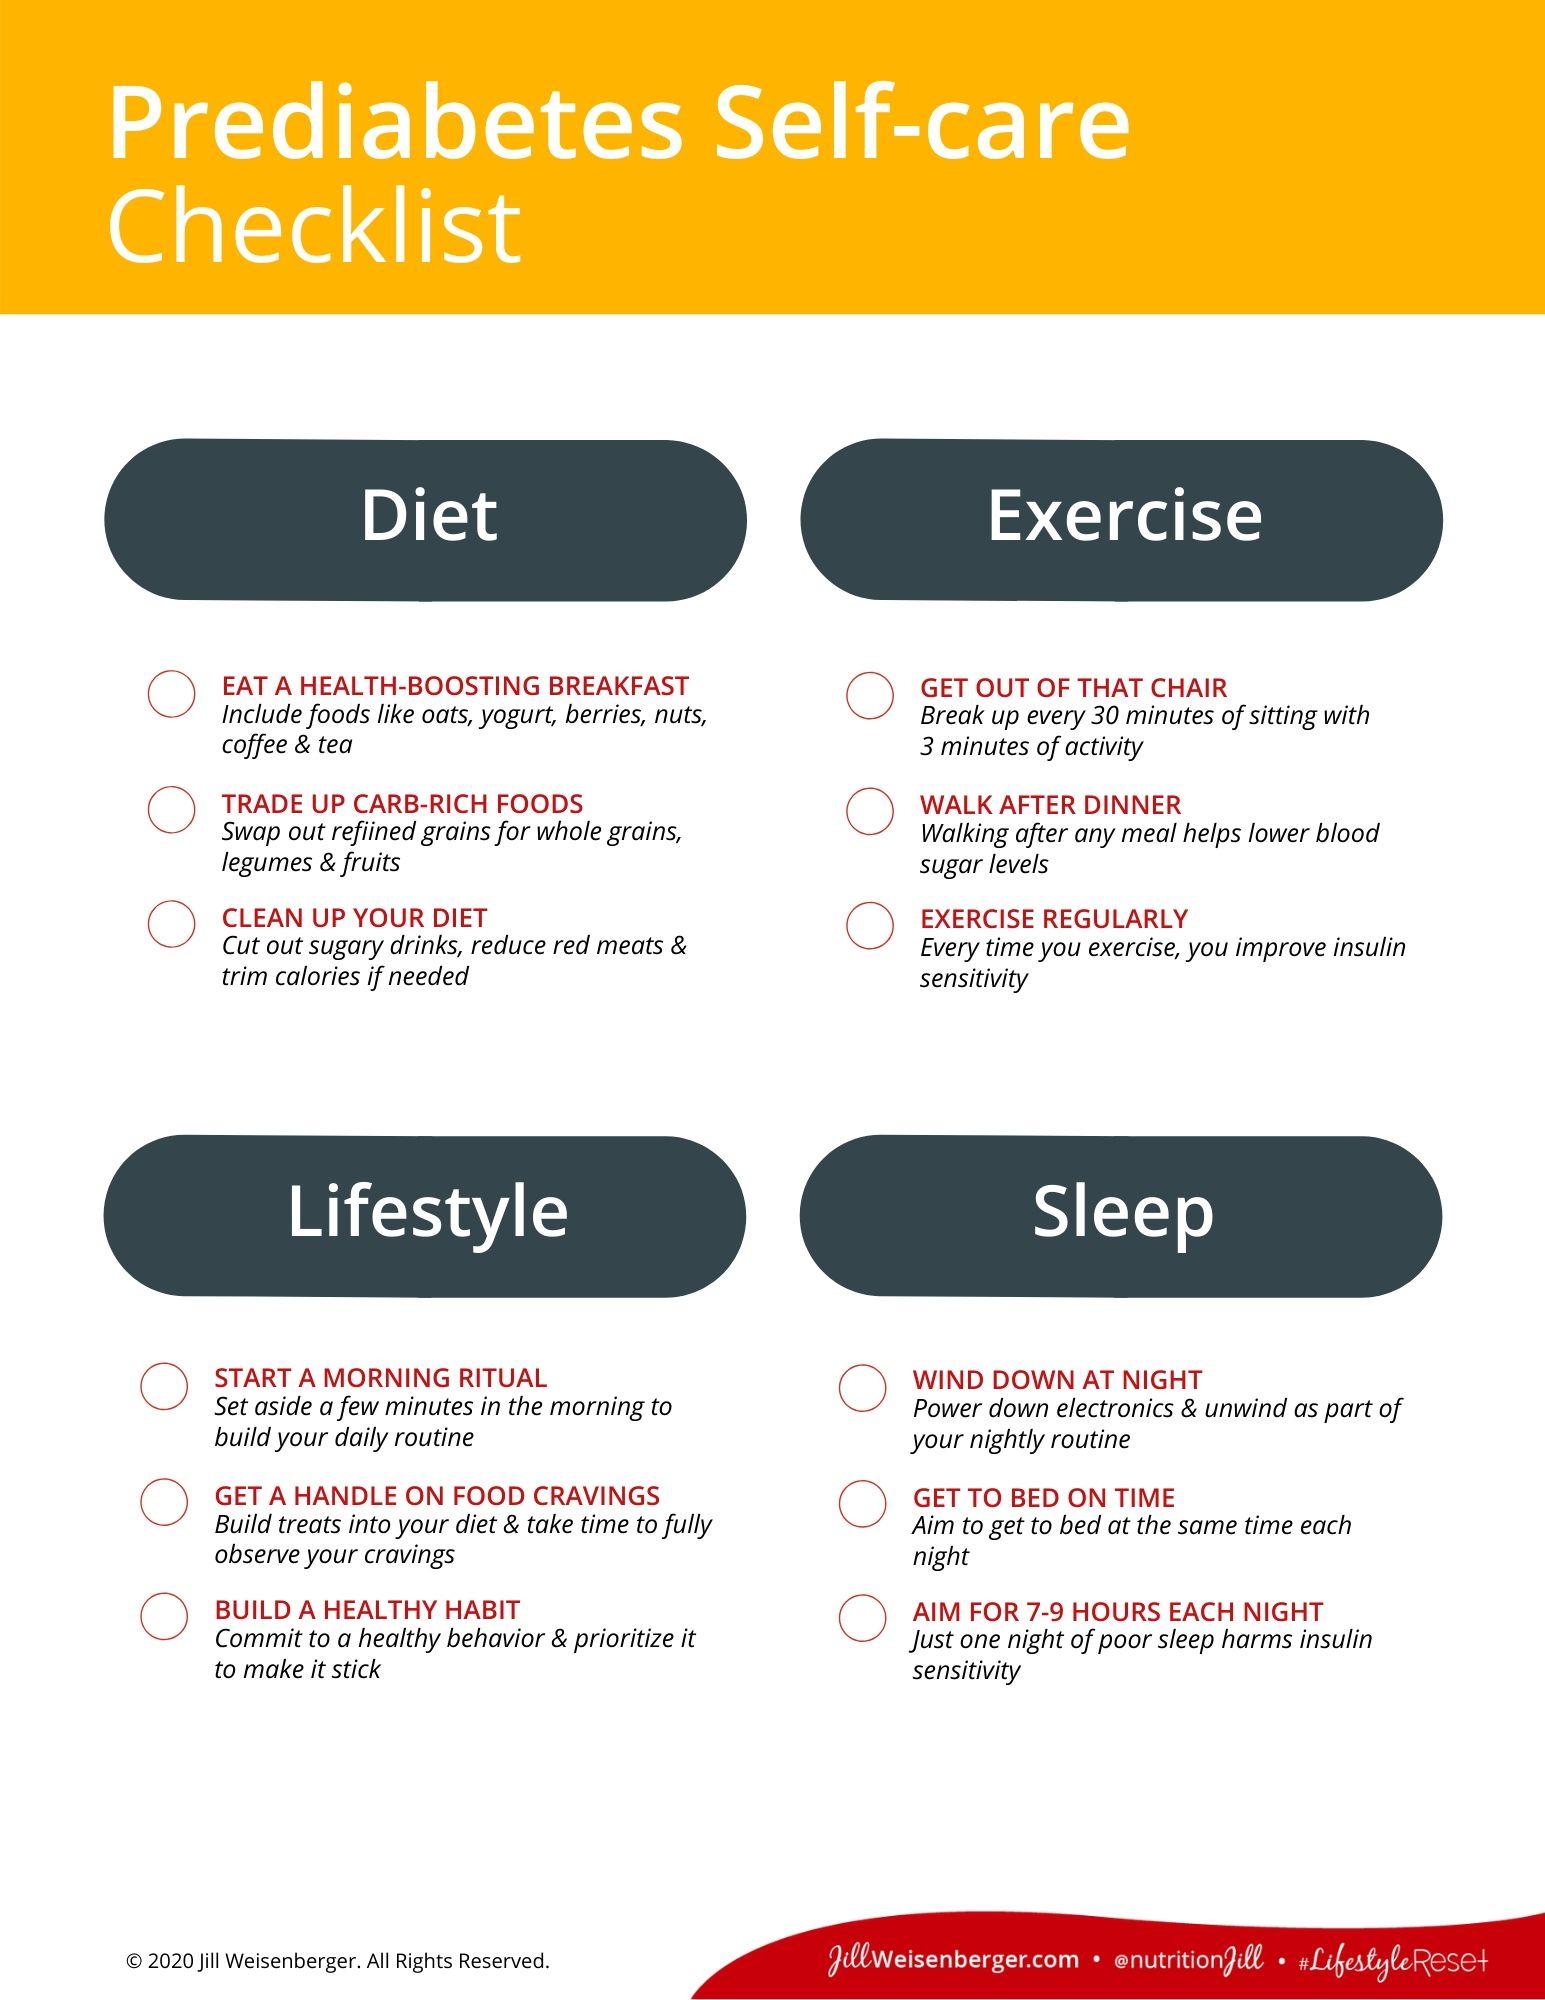 Jill-Weisenberger_Pre-diabetes-Self-care-Checklist